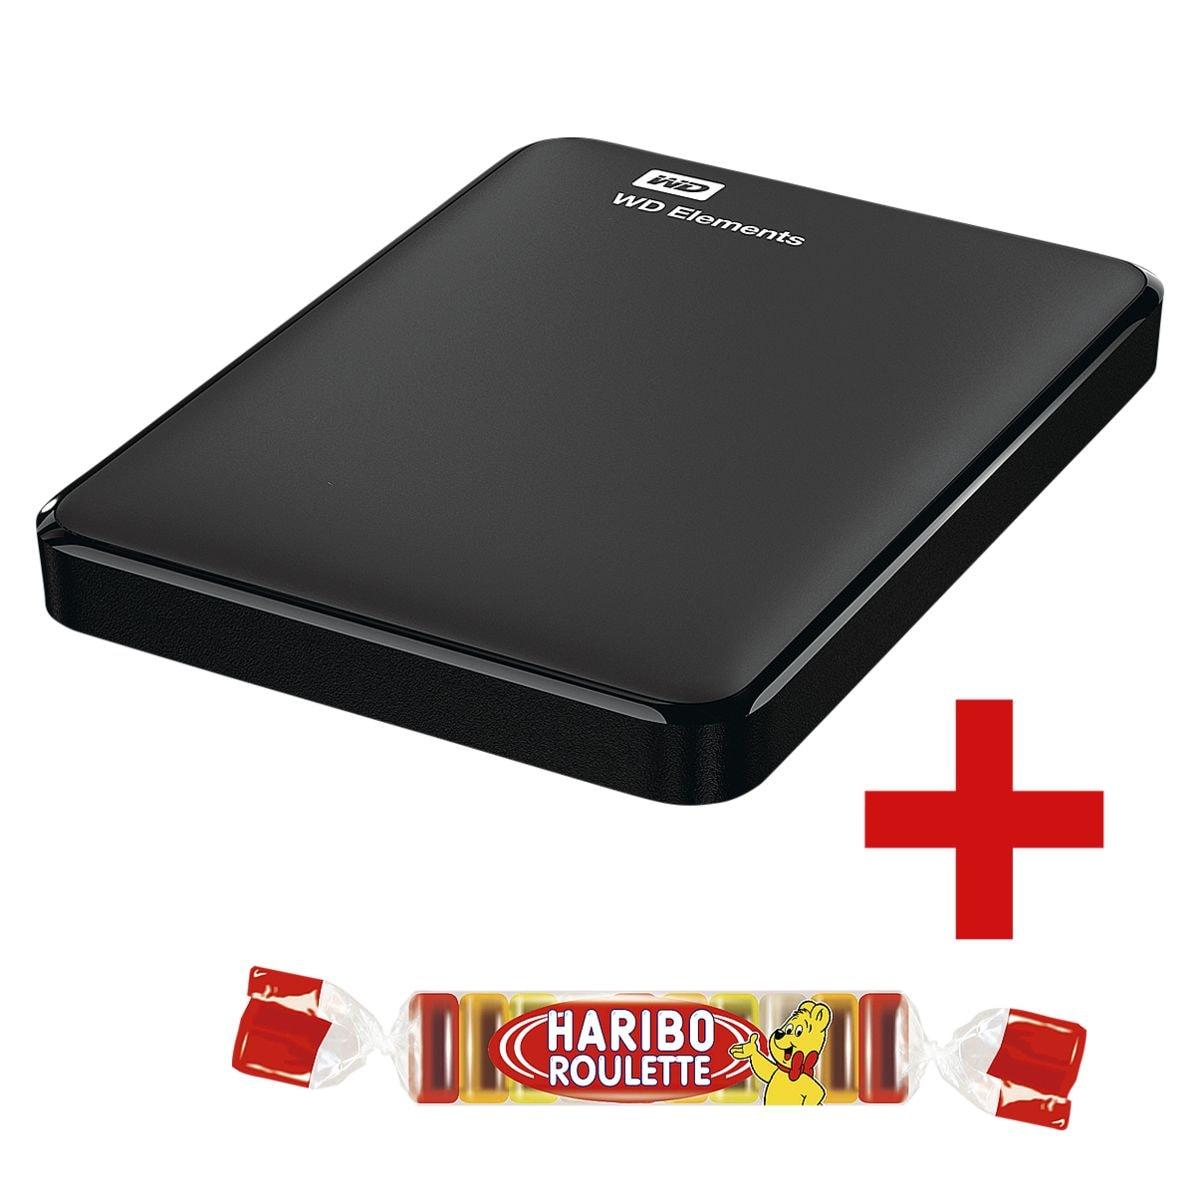 Westerndigital Elements 1 TB, externe HDD-Festplatte, USB 3.0, 6,35 cm (2,5 Zoll), inkl. Fruchtgummi »Roulette« 25 g